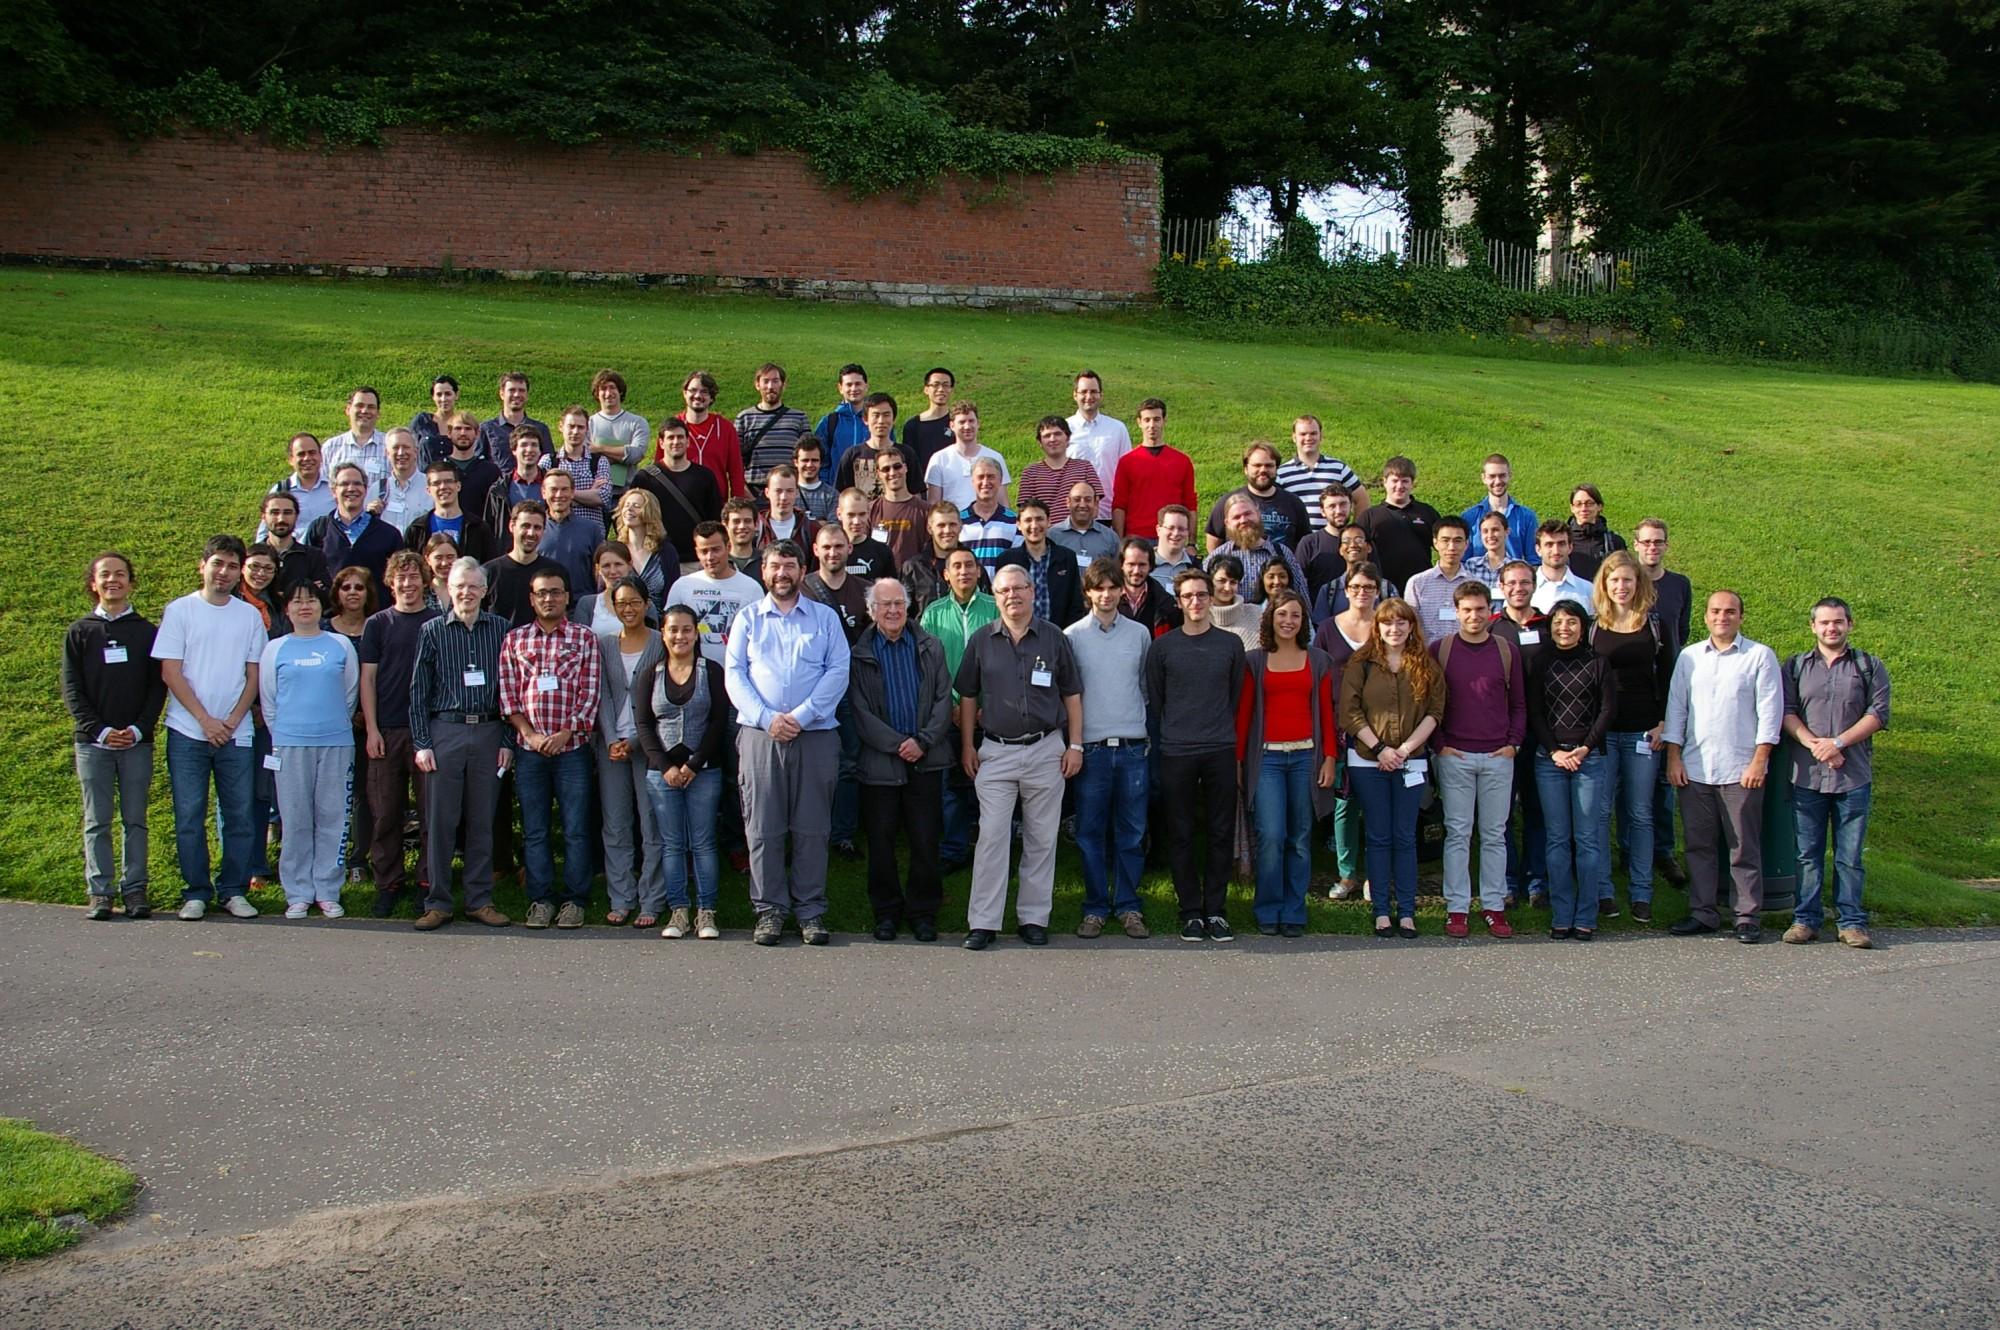 SUSSP69 Group Photograph No. 3 Copyright Alan Walker, University of Edinburgh.